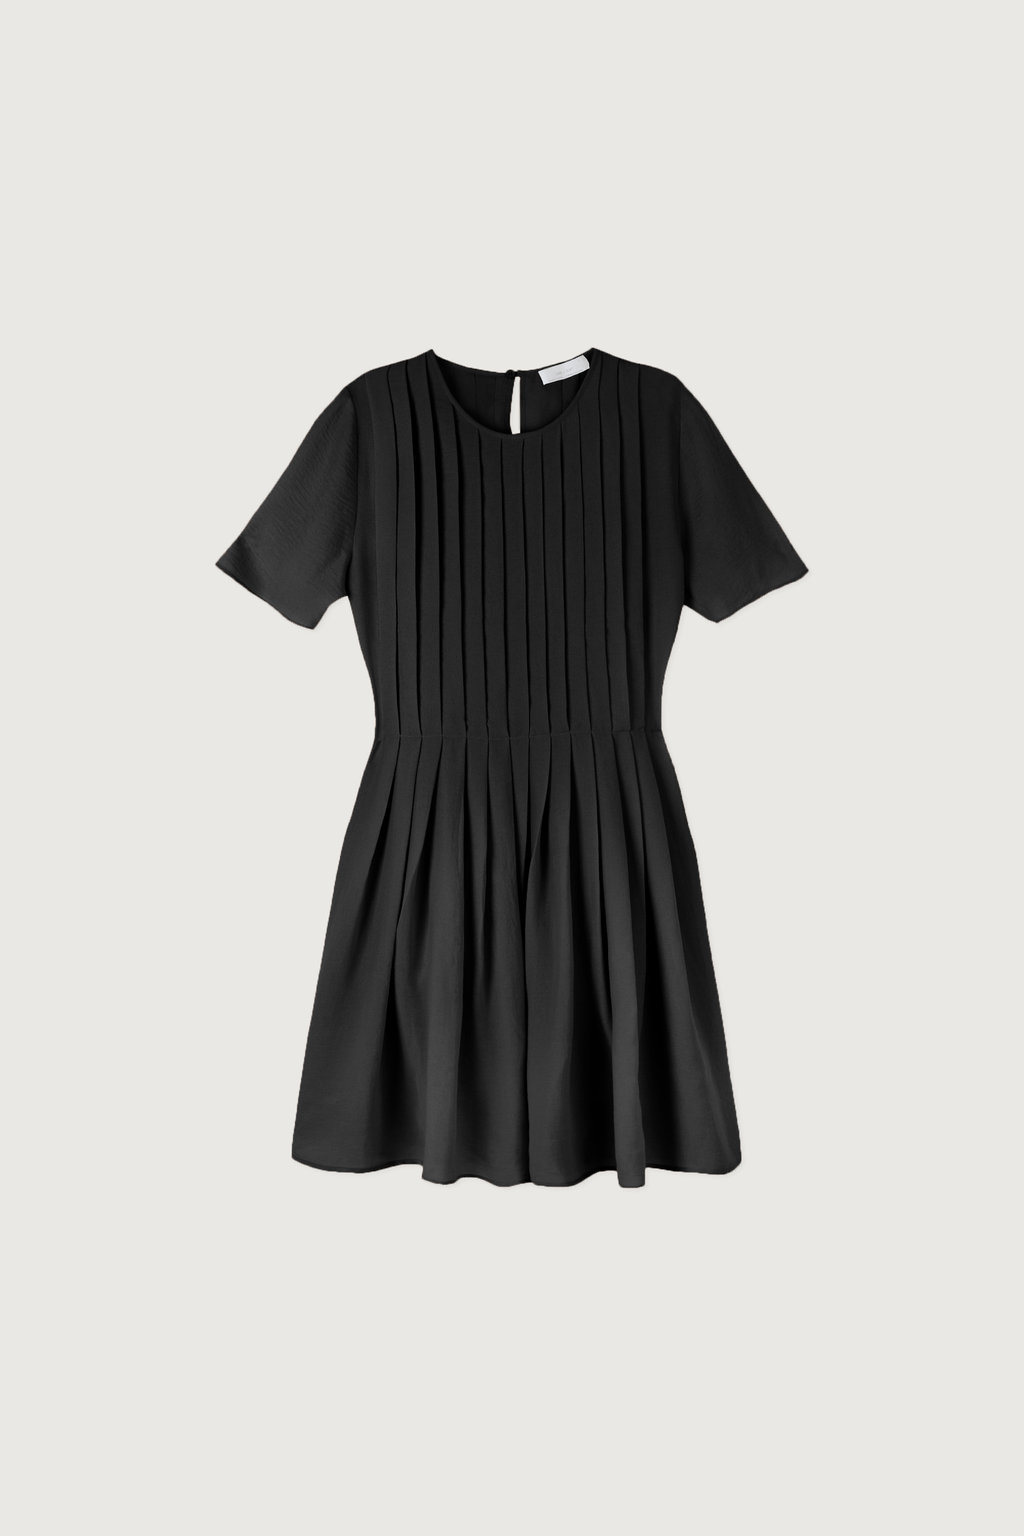 Dress 3257 Black 7